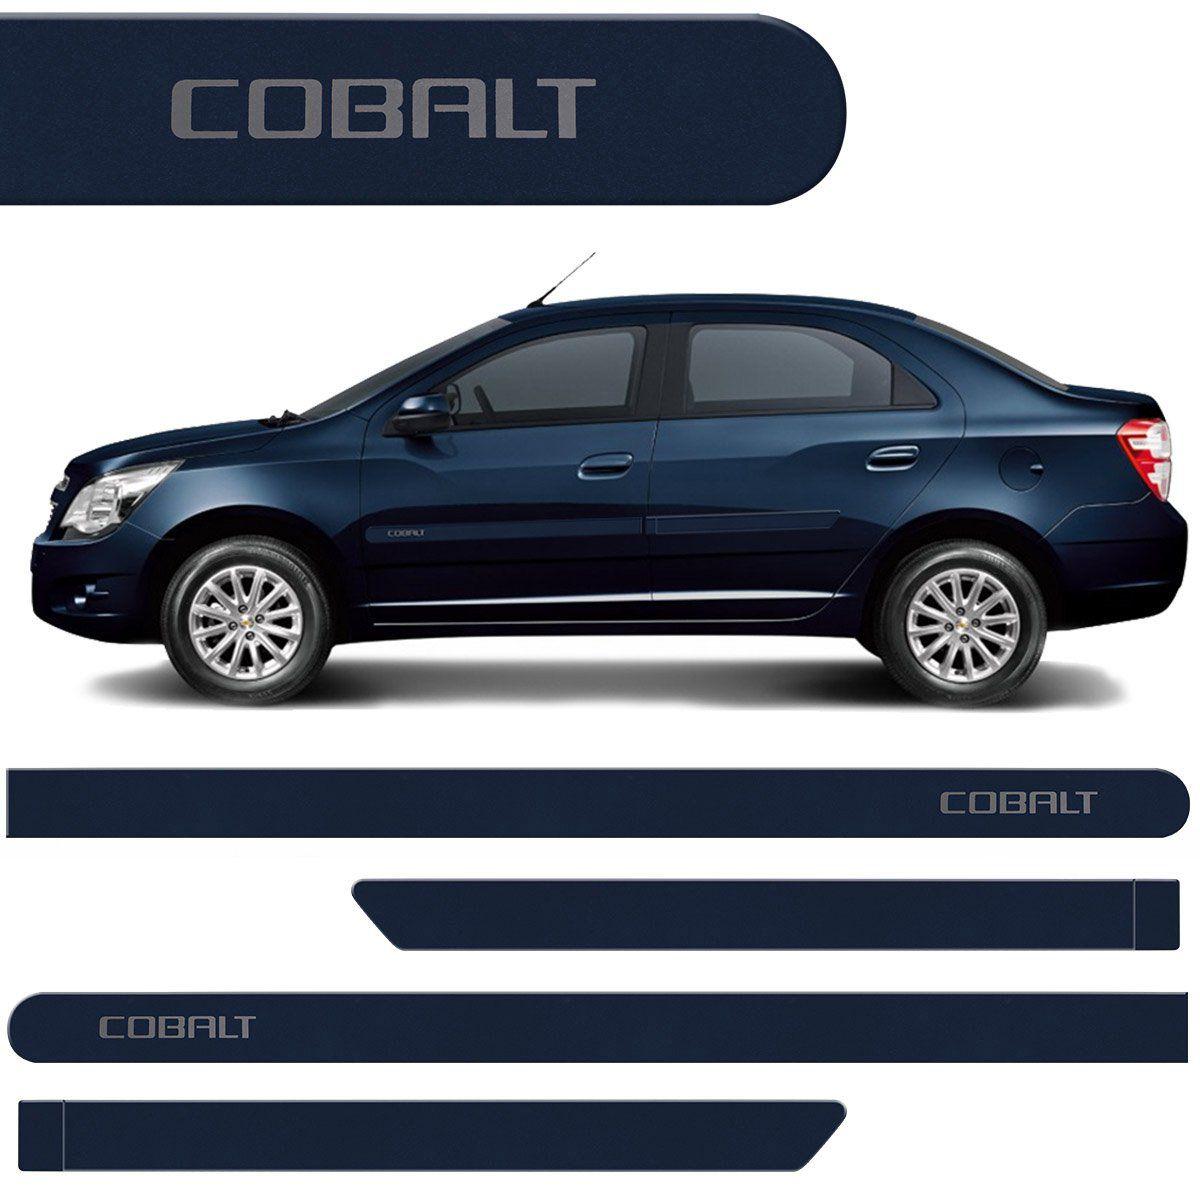 Jogo Friso Lateral Cobalt 2012 2013 2014 2015 Azul Macaw